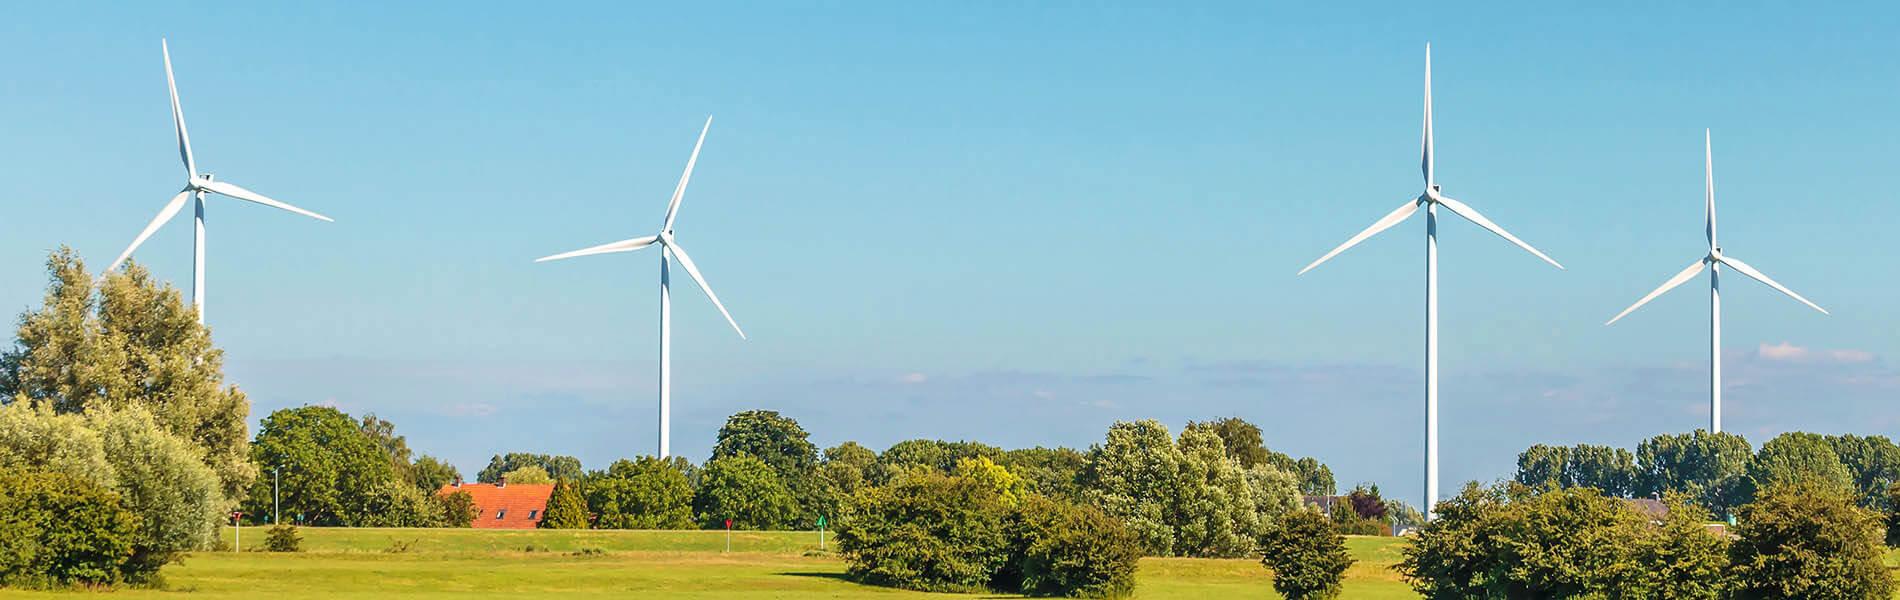 Energietransitie windmolenparken Keller Grondzaken B.V.